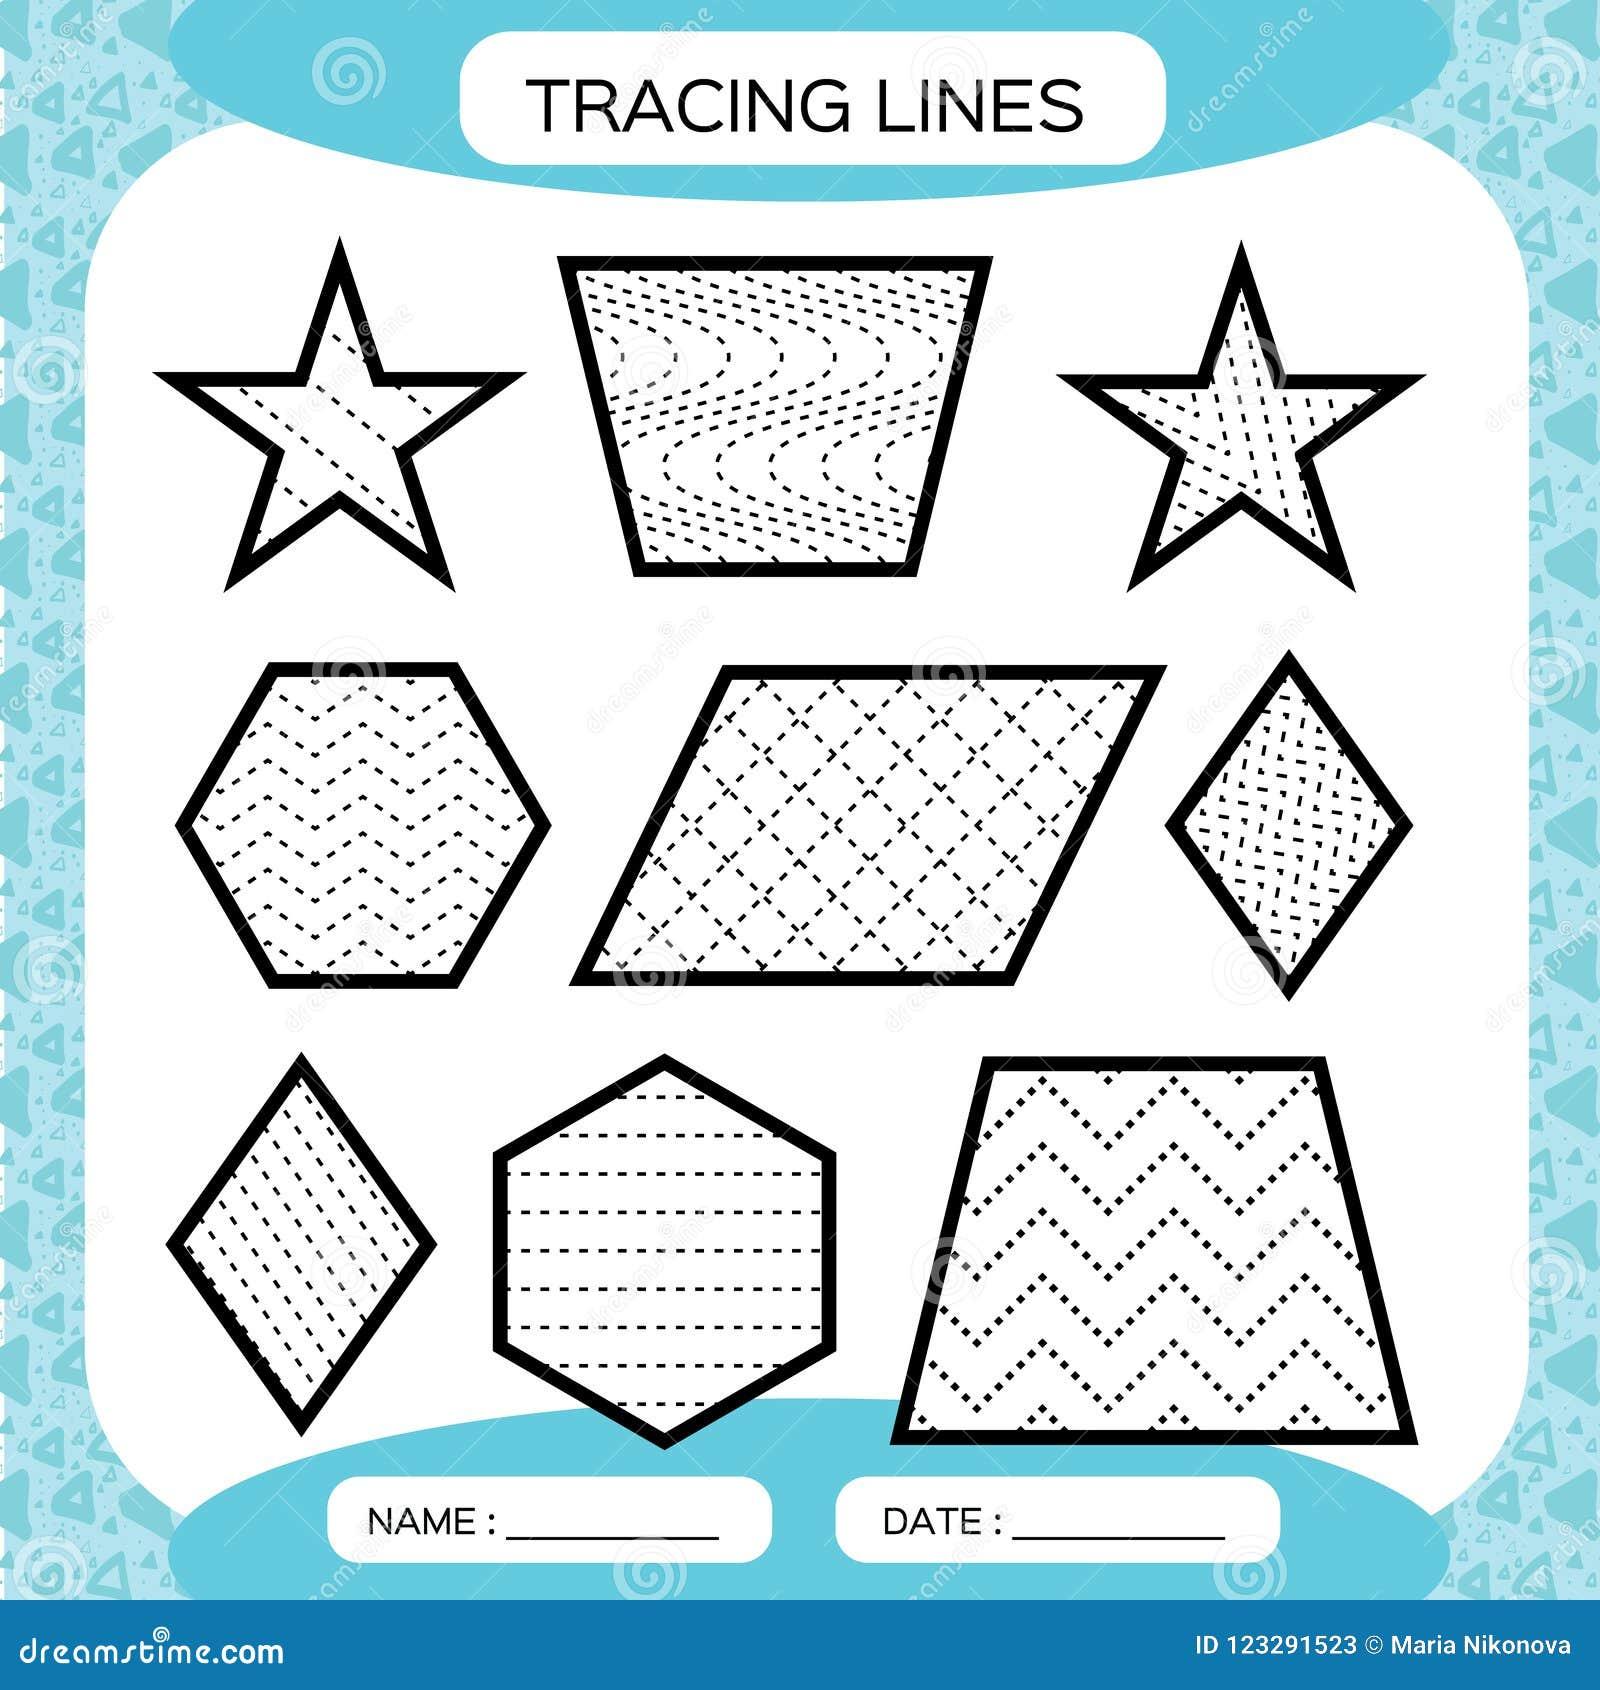 Tracing Lines Kids Education Preschool Worksheet Basic Writing Doing Worksheets